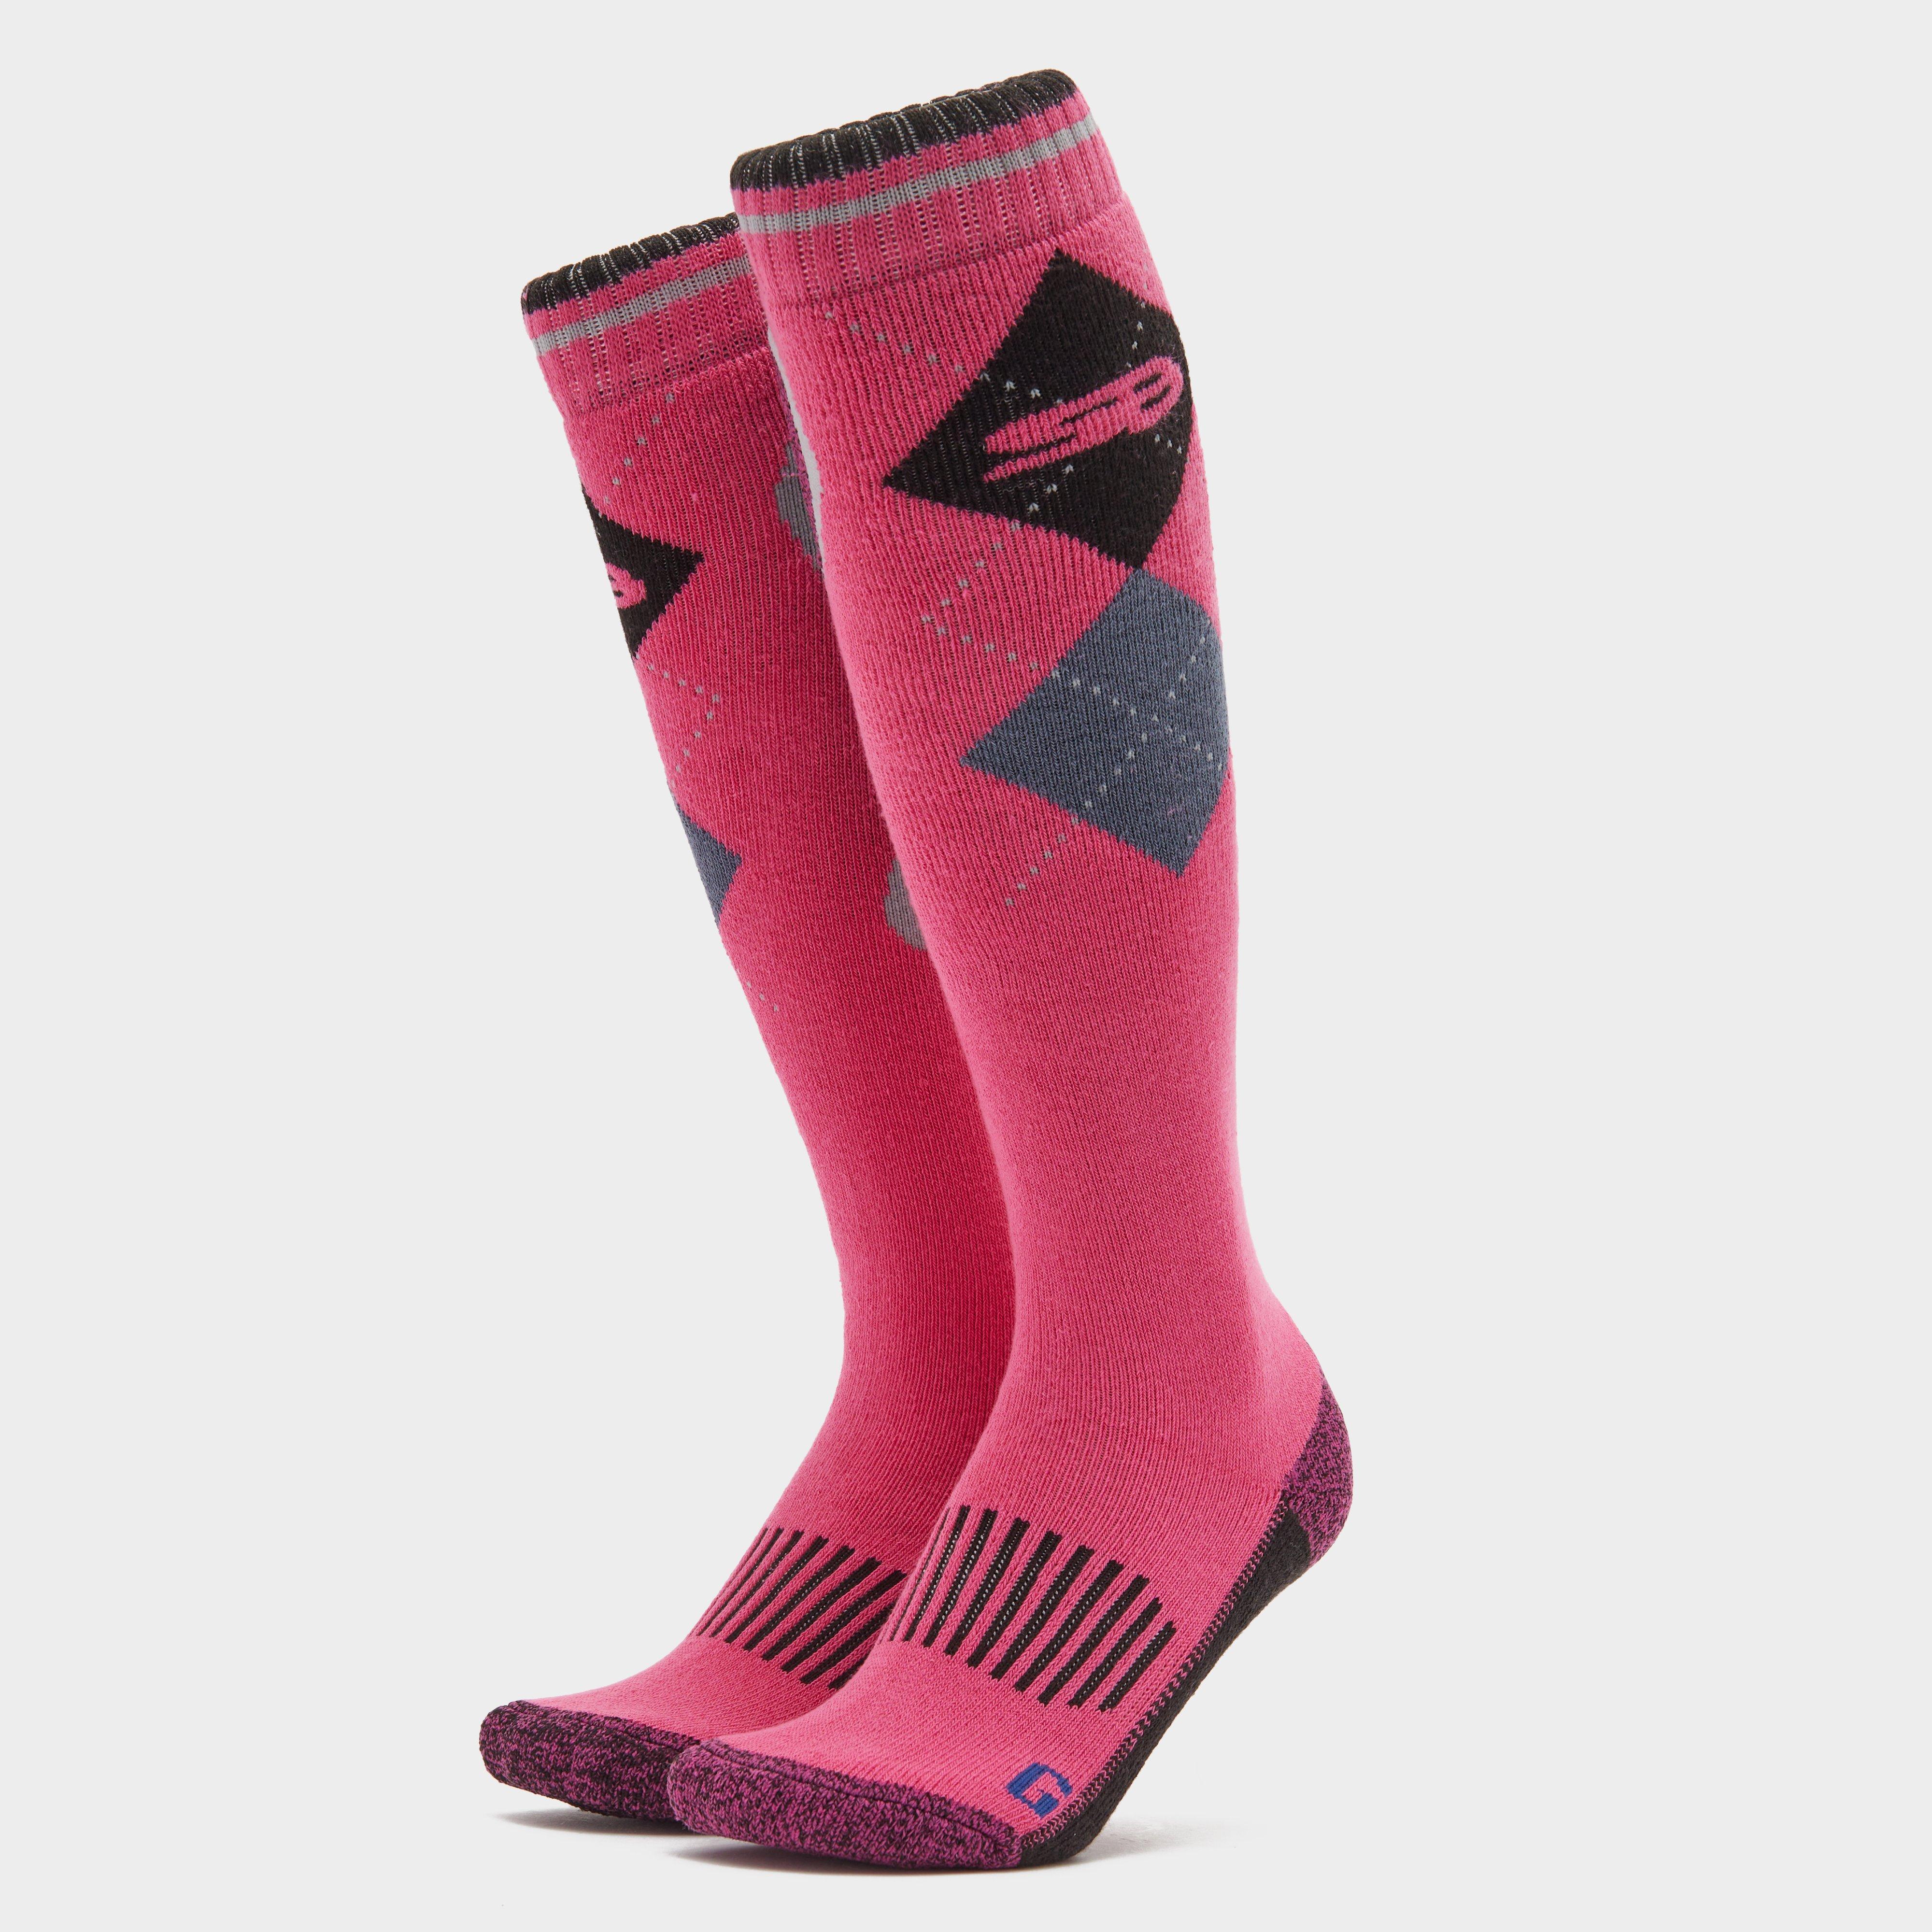 Image of Storm Bloc Women's Patterdale Long Socks - Black/Black, Black/Black